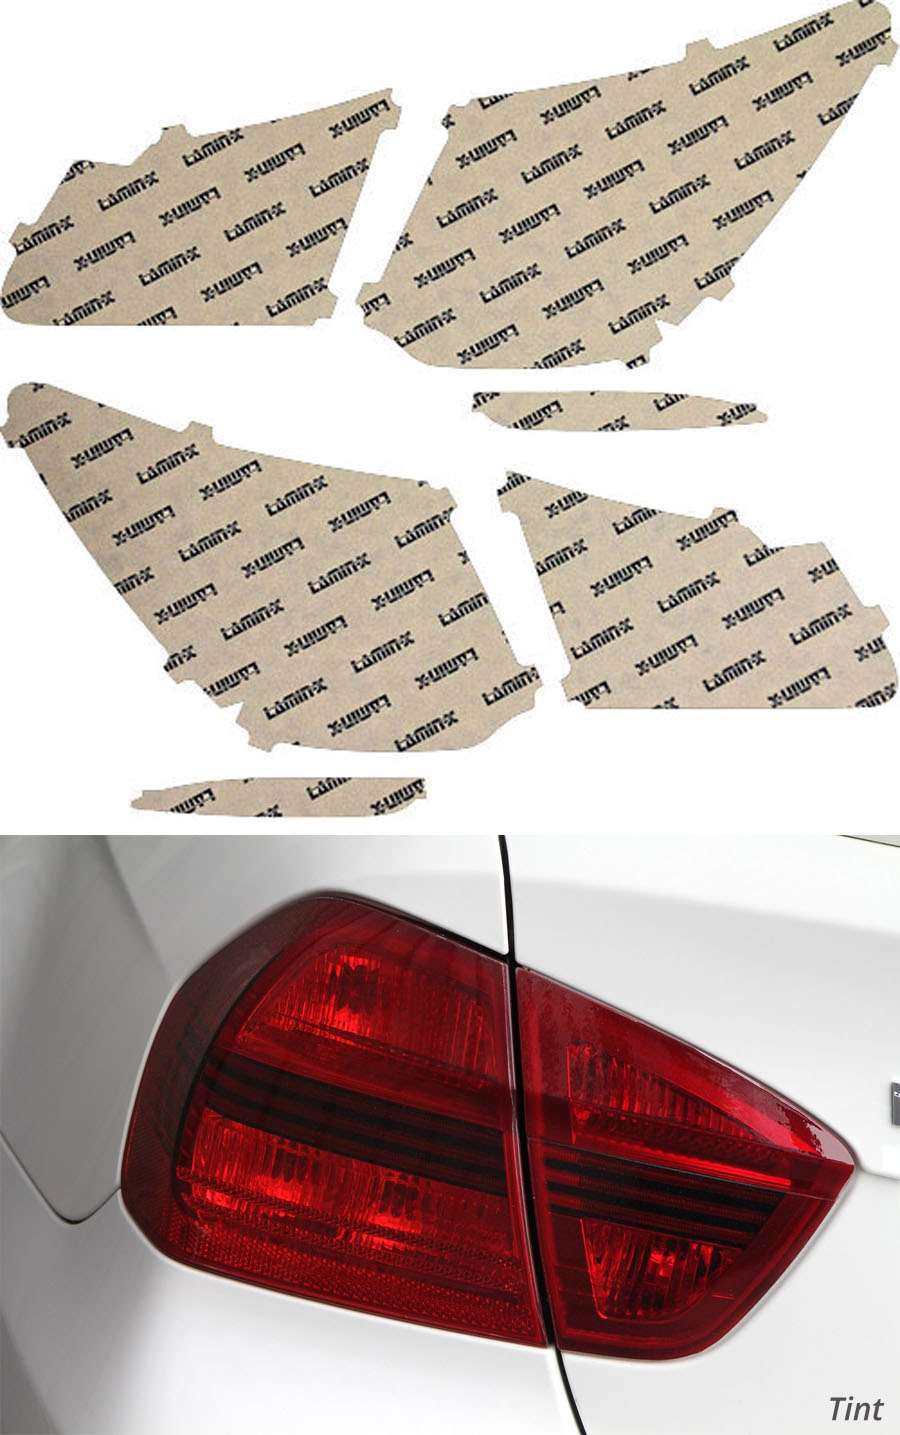 Acura RLX 14-20 Tint Tail Light Covers Lamin-X AC226T